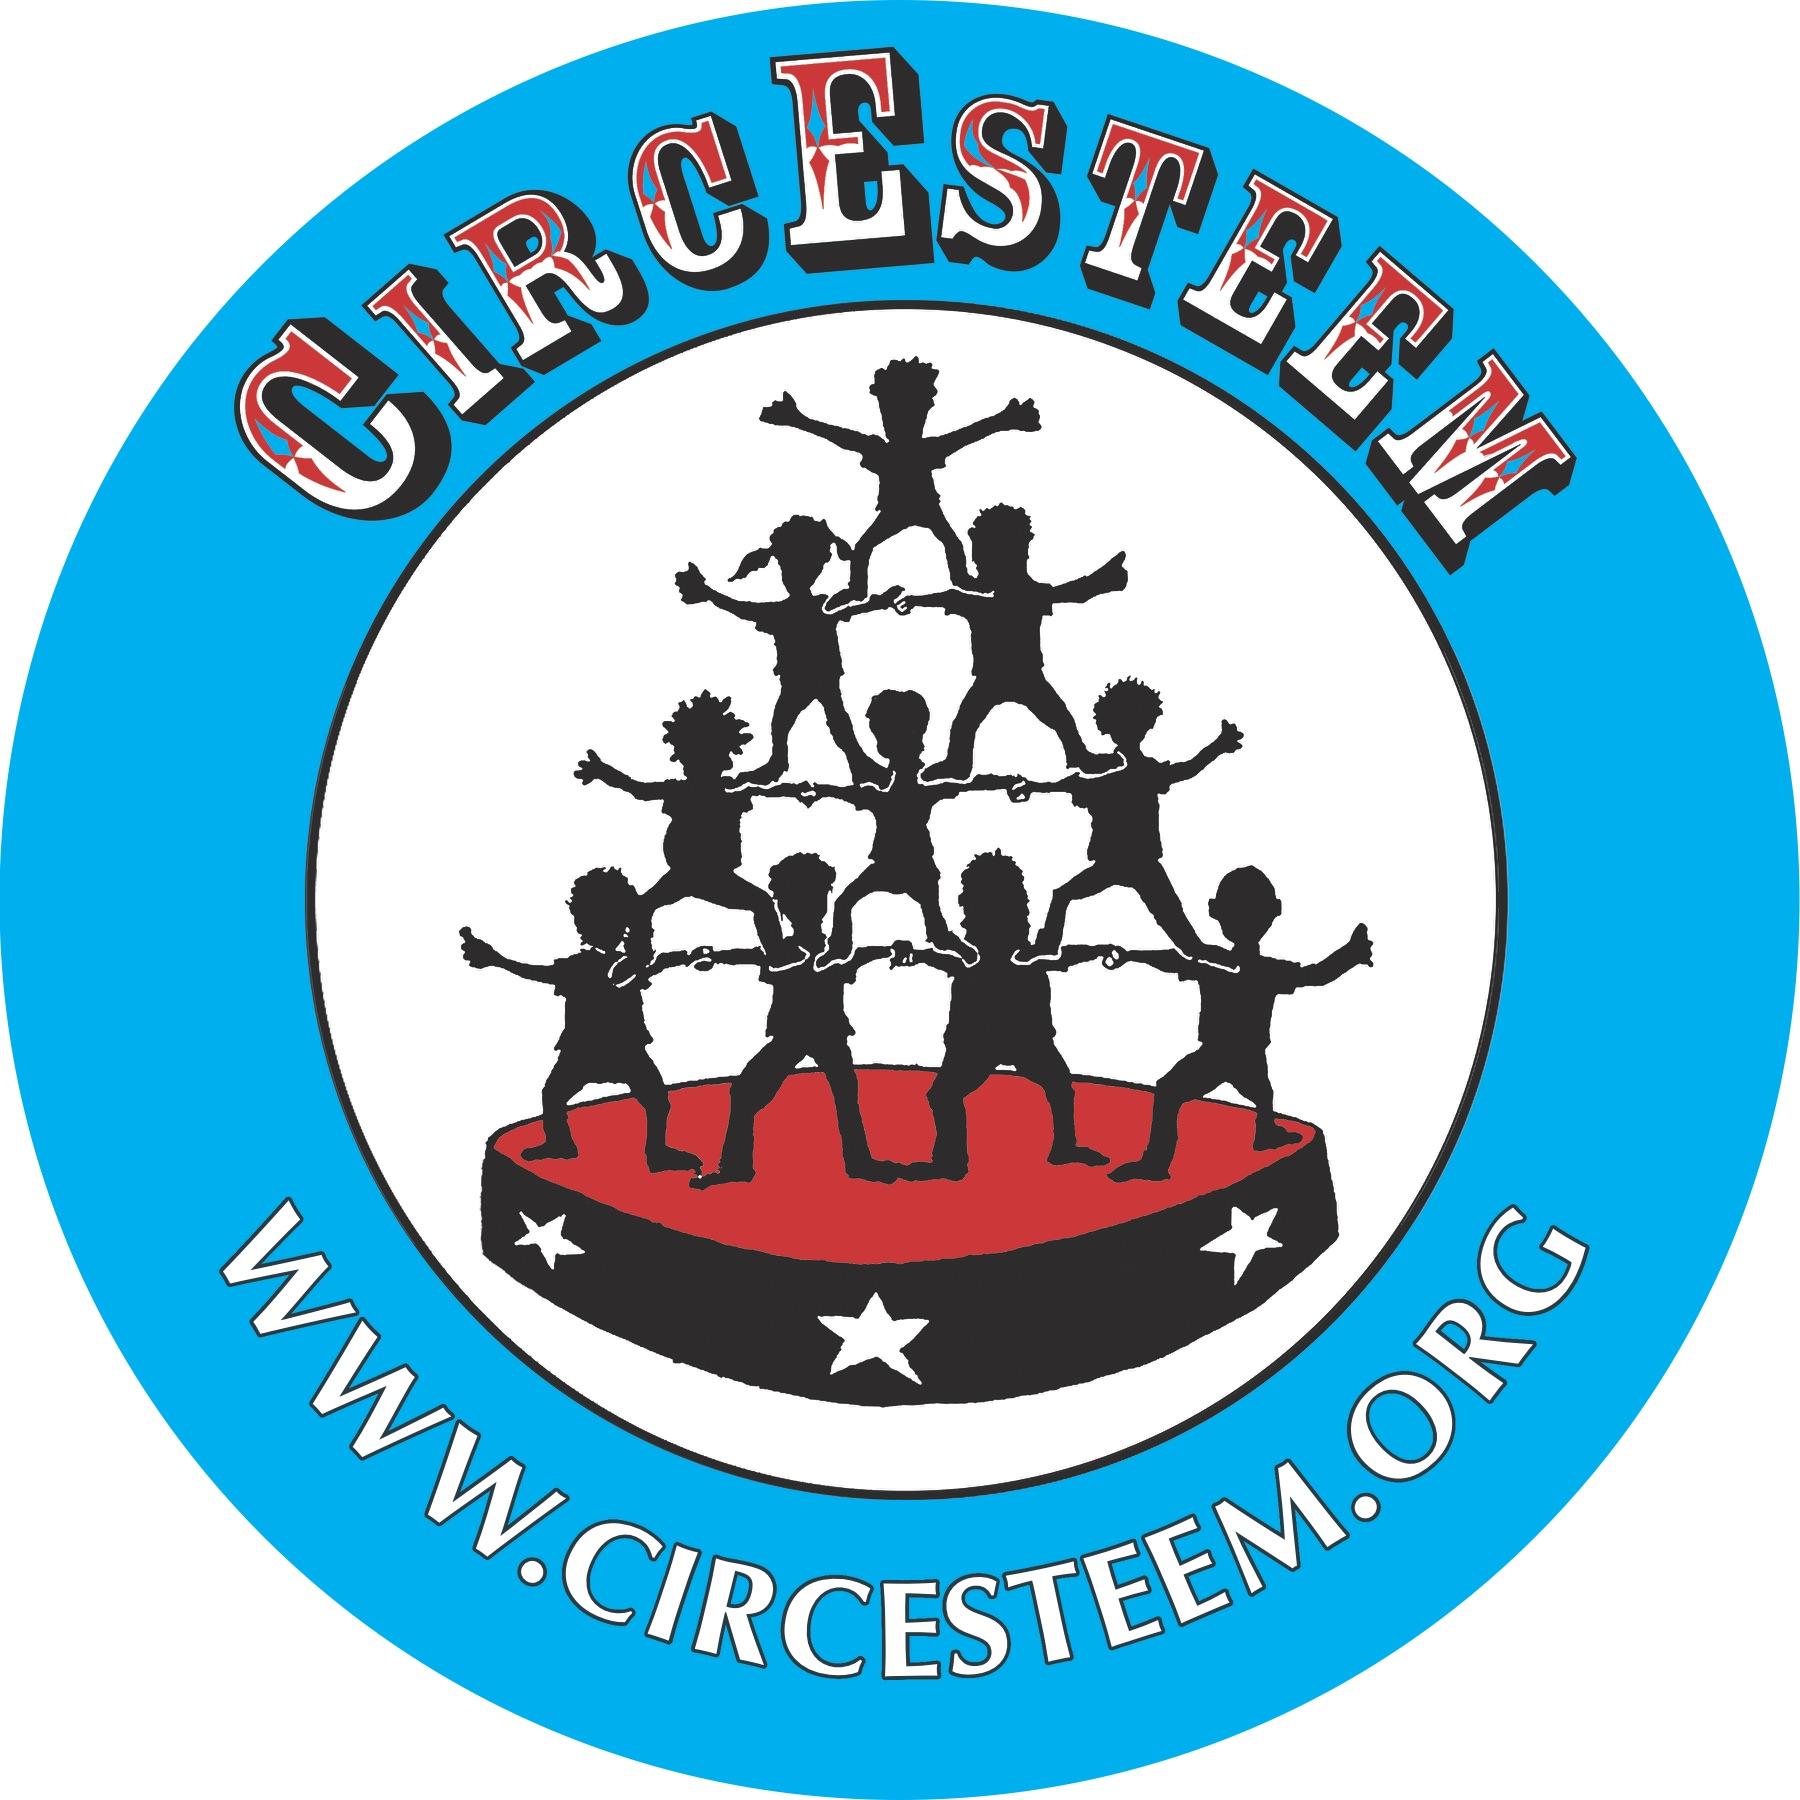 http://circesteem.org/